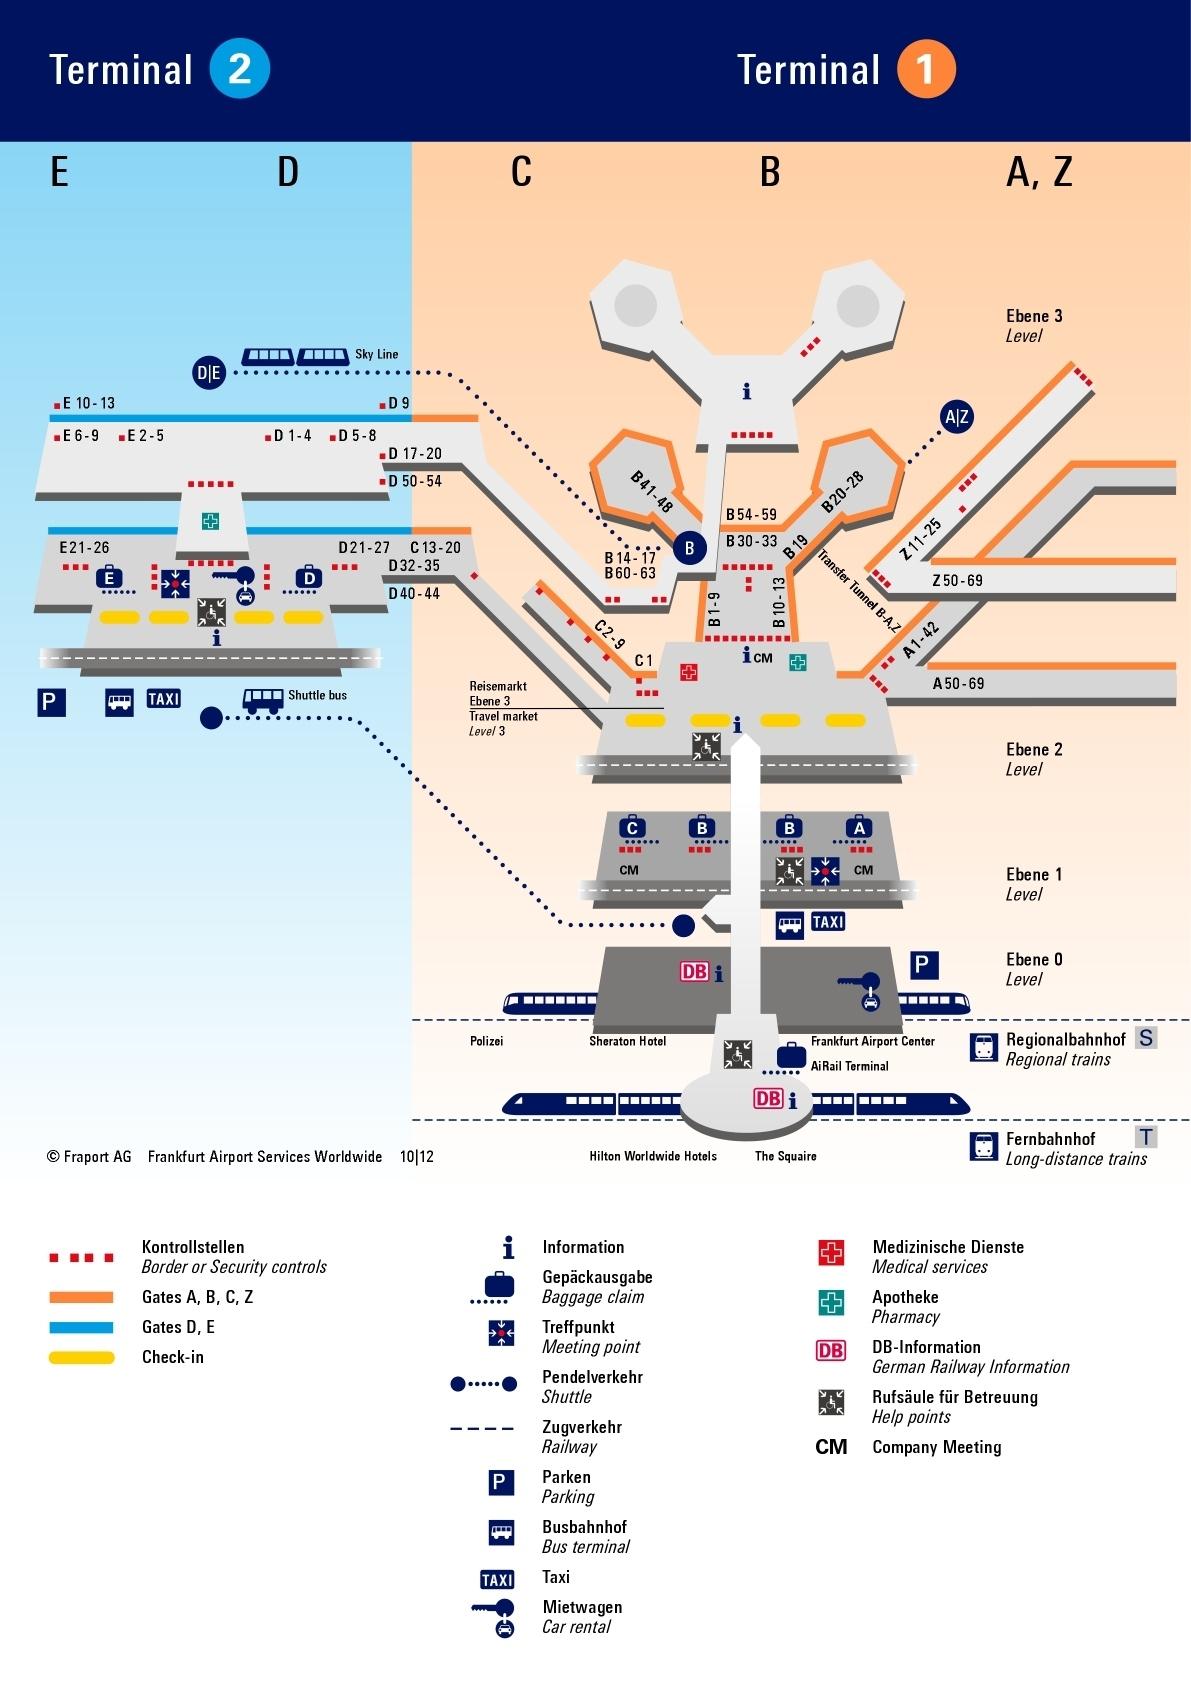 Схема терминалов аэропорта Франкфурт на Майне